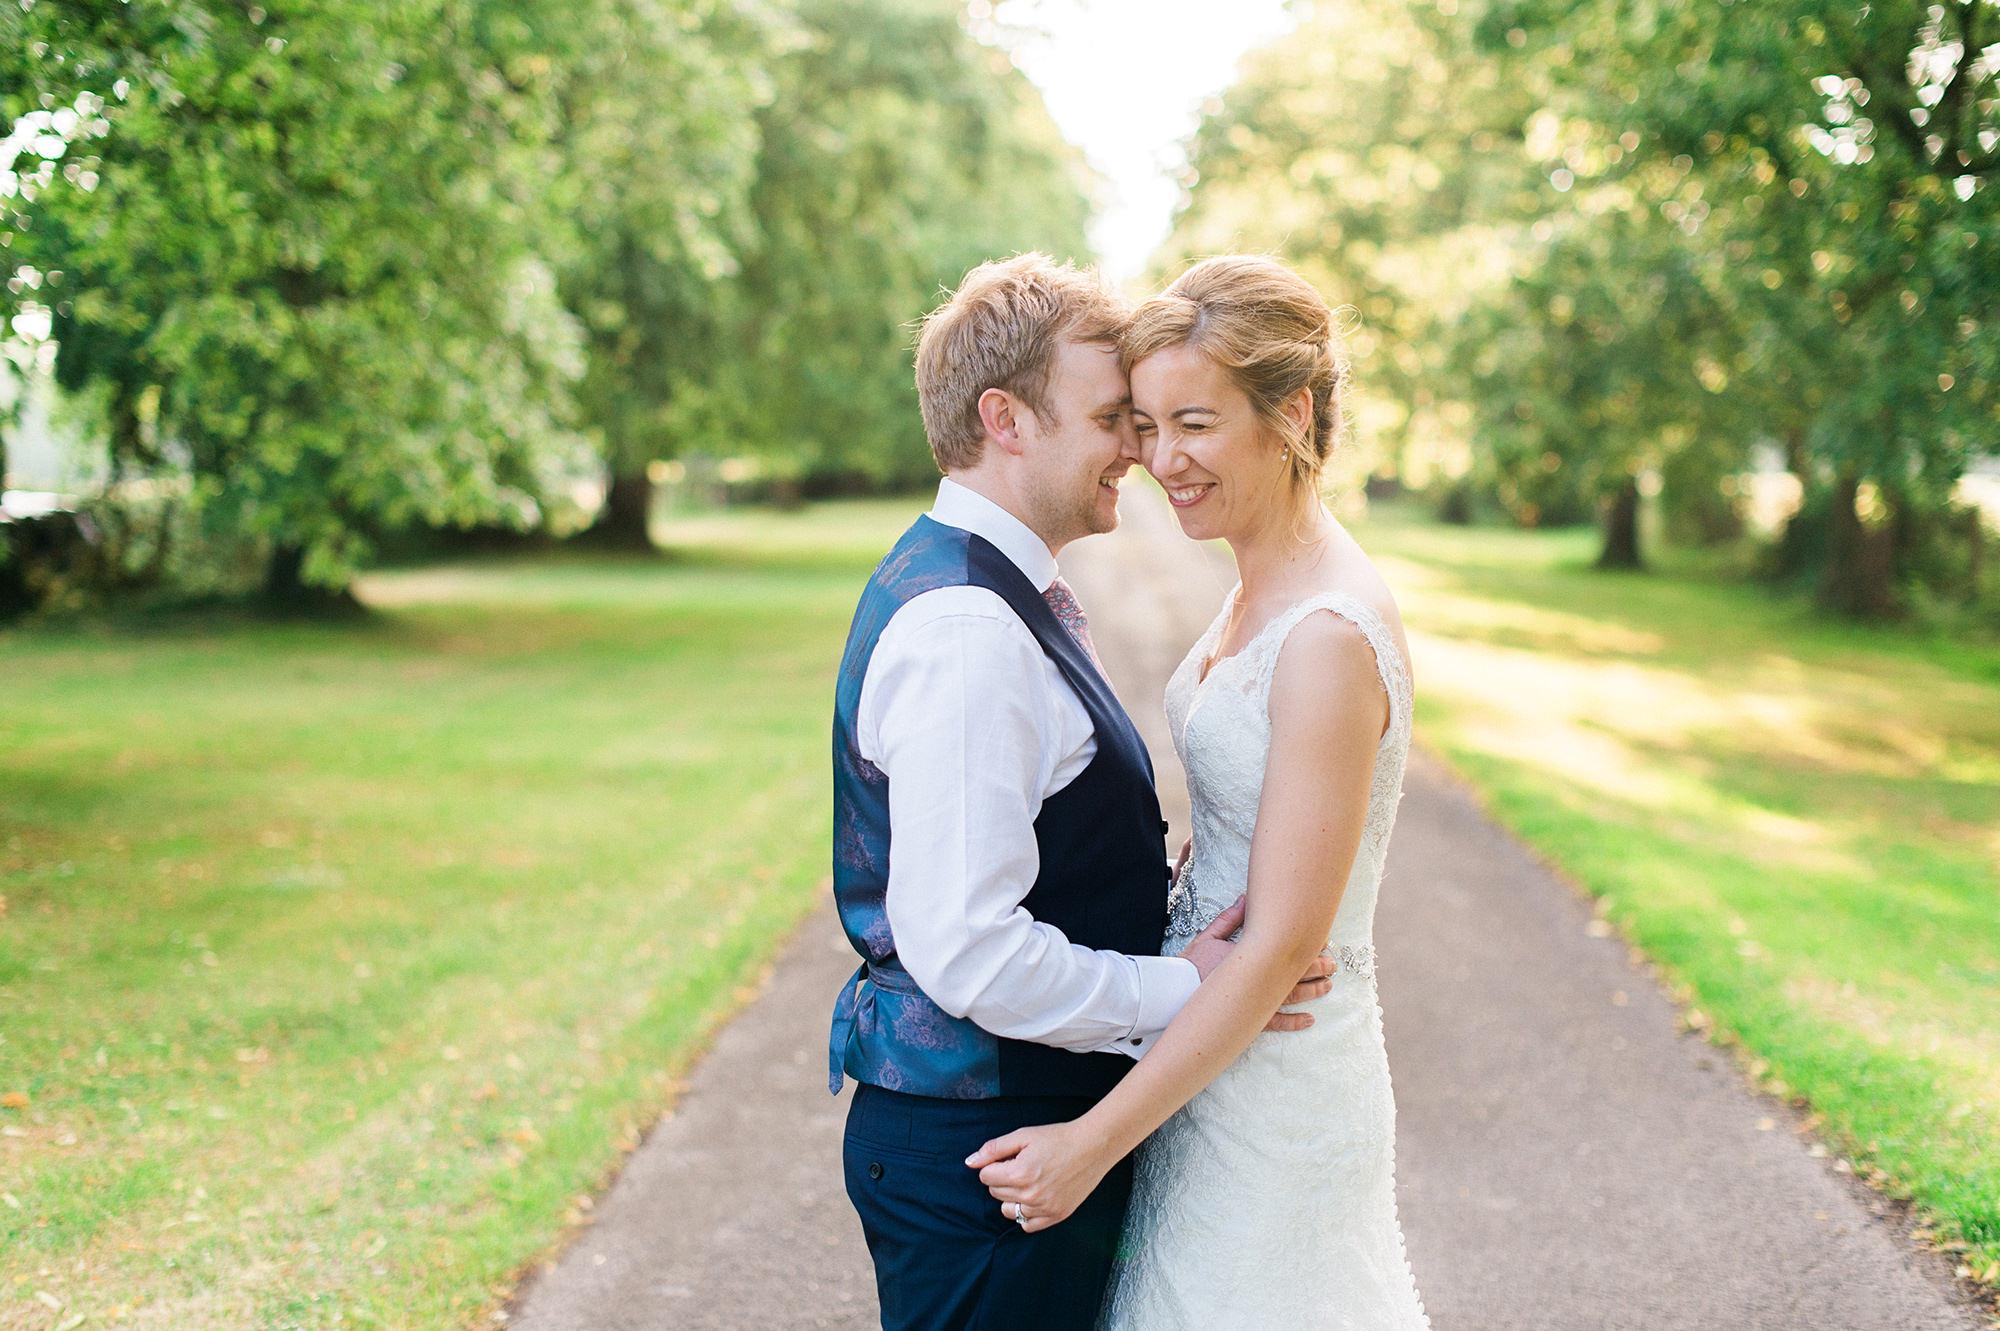 Simon biffen-best of 2015 wedding photographs-26